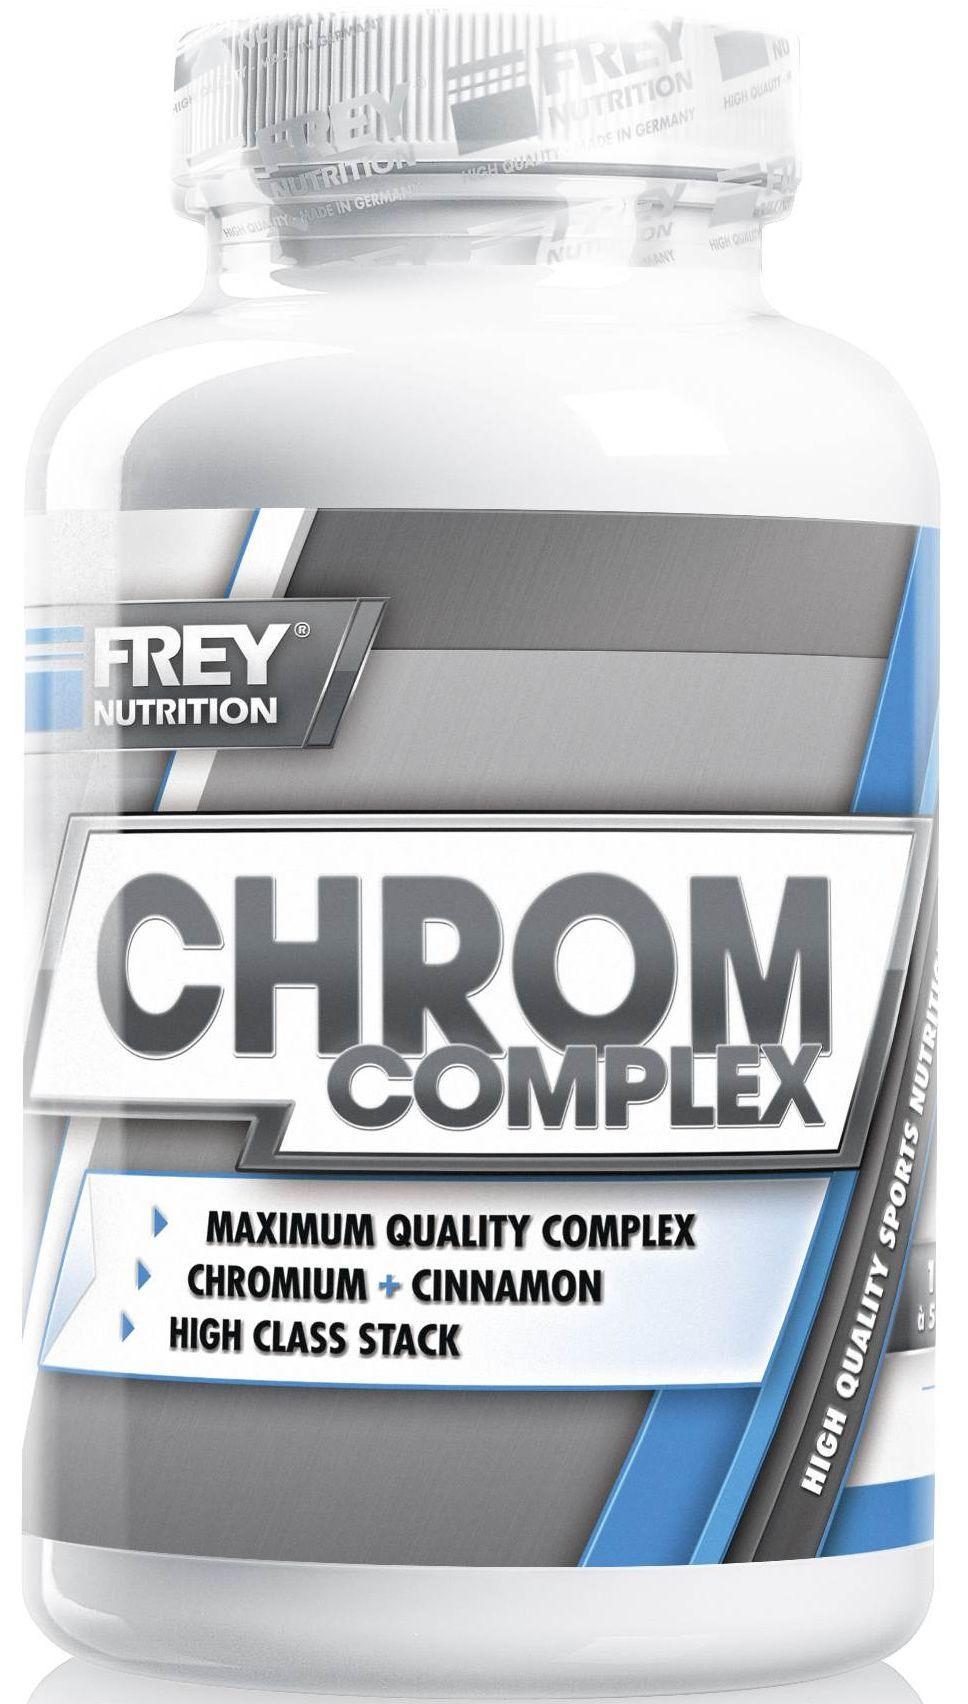 Frey Nutrition Chrom Complex - 180 Kapseln